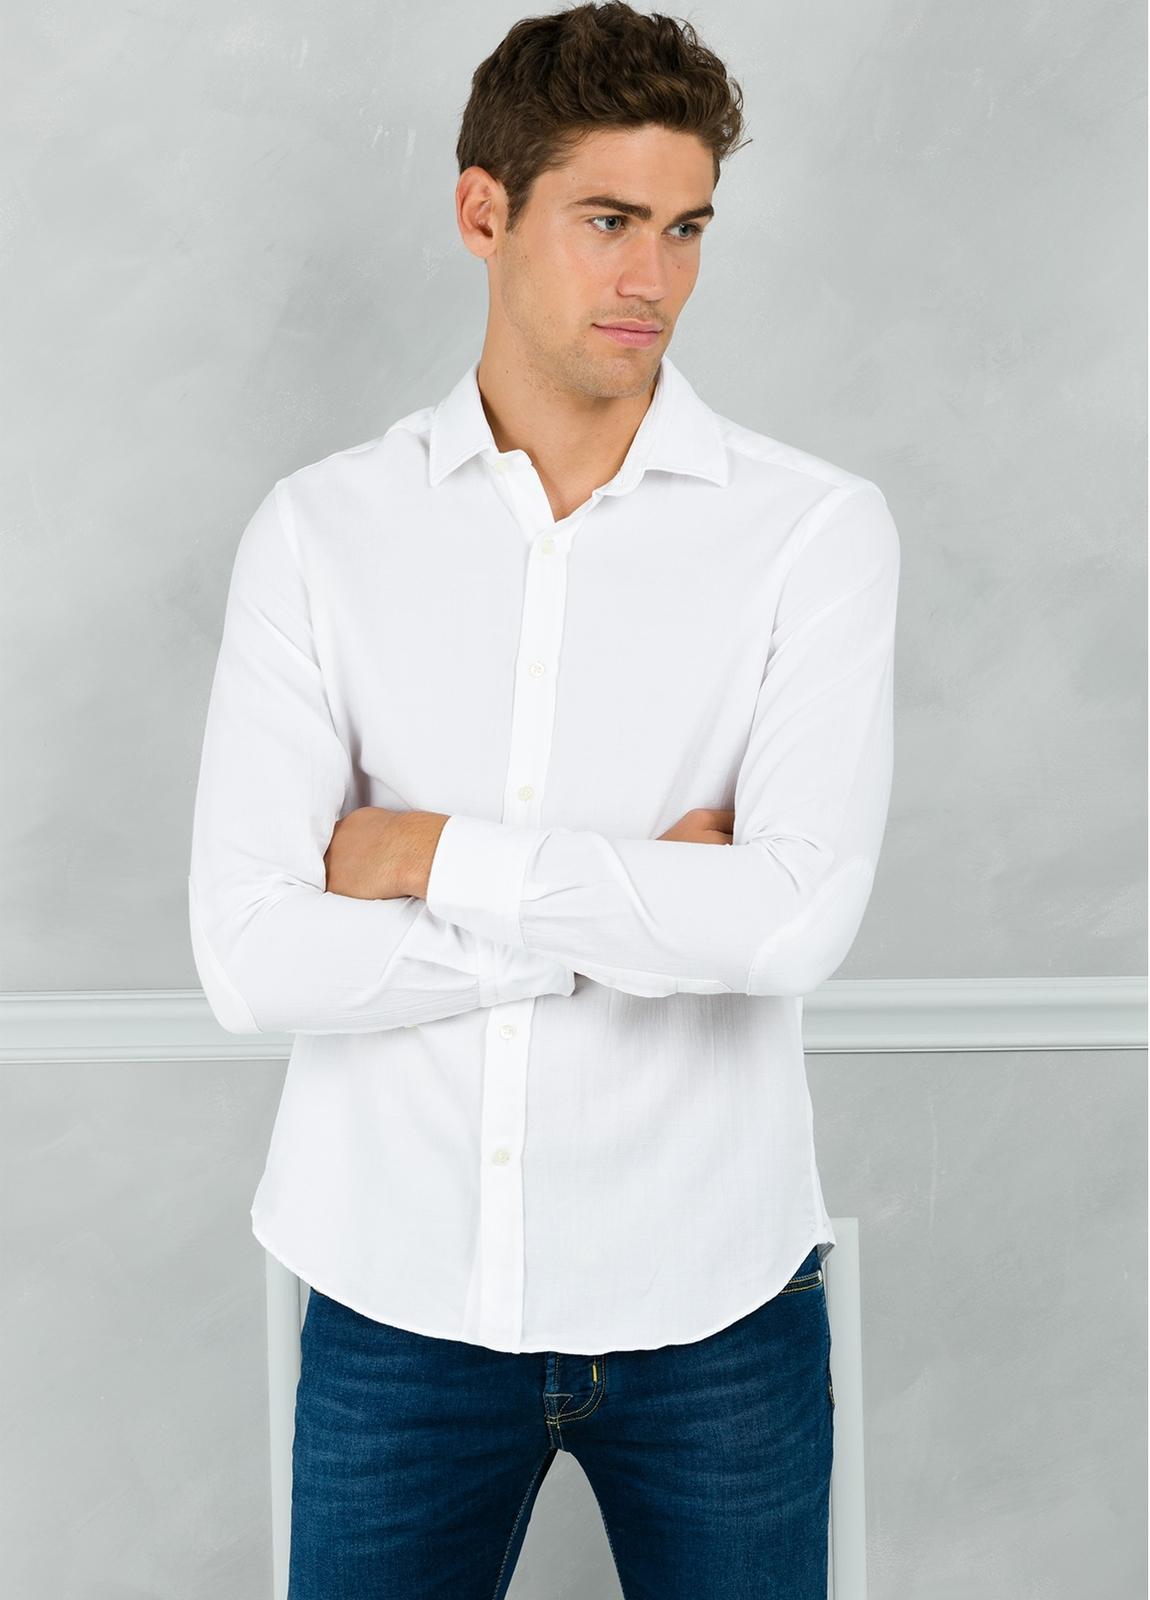 Camisa Leisure Wear REGULAR FIT modelo PORTO color blanco. 100% Algodón. - Ítem2